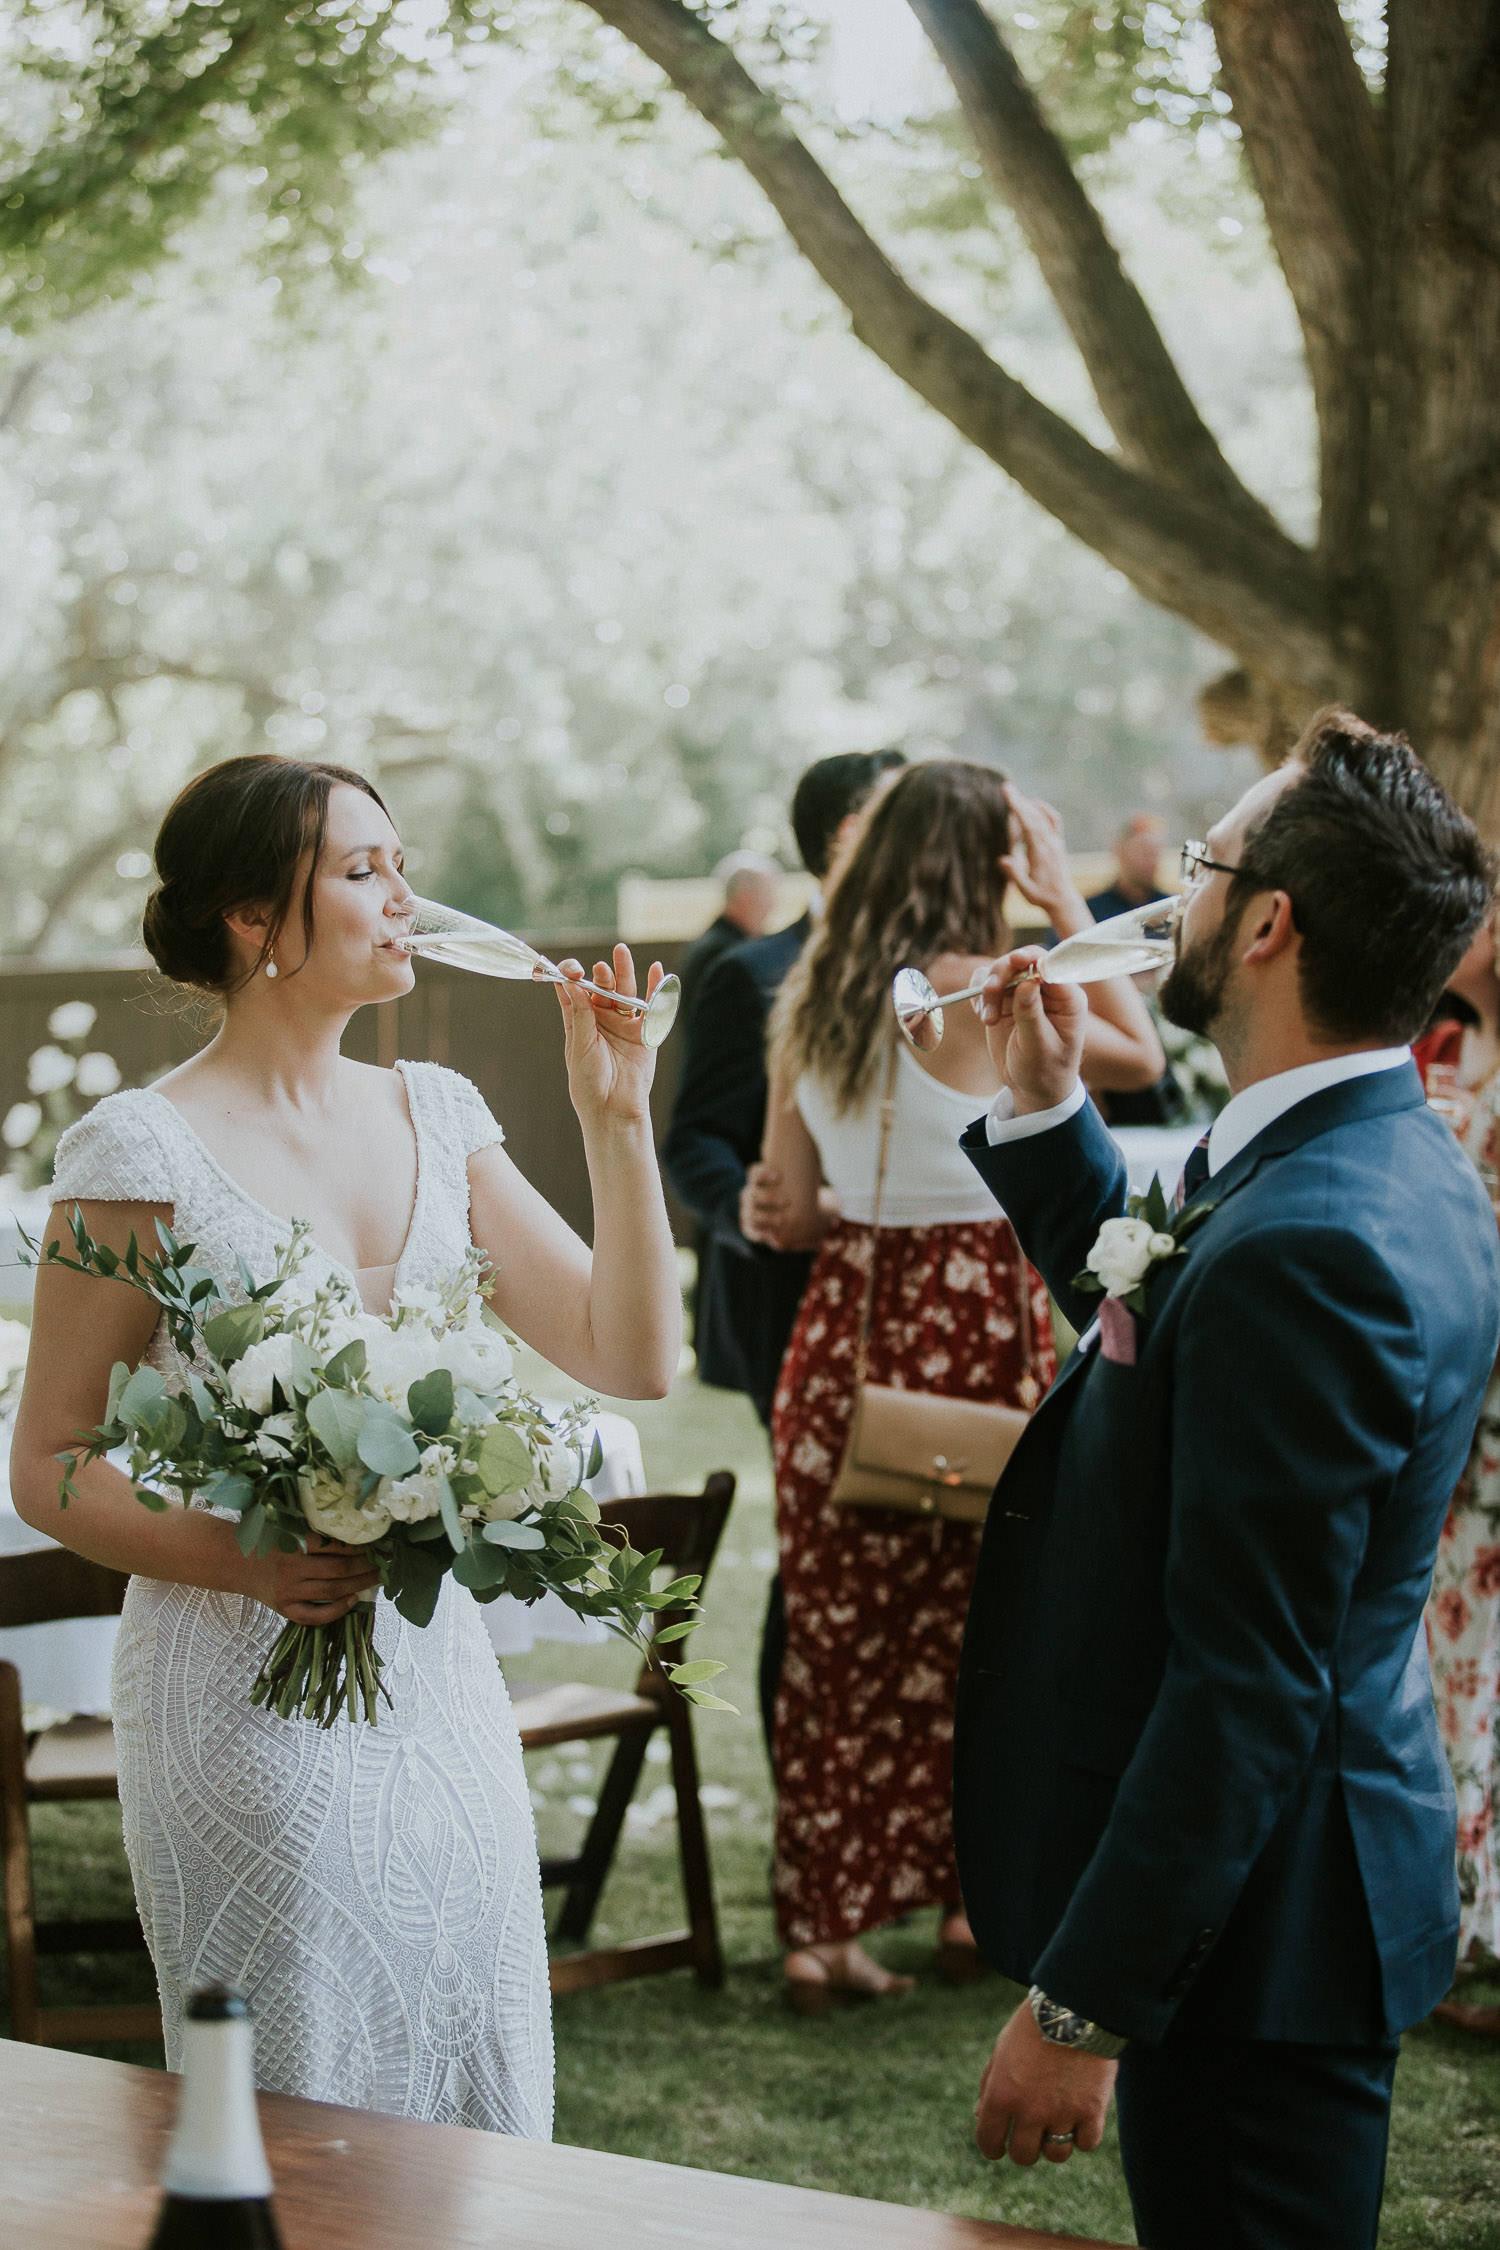 summer-backyard-wedding-in-alberta-sarah-pukin-0132